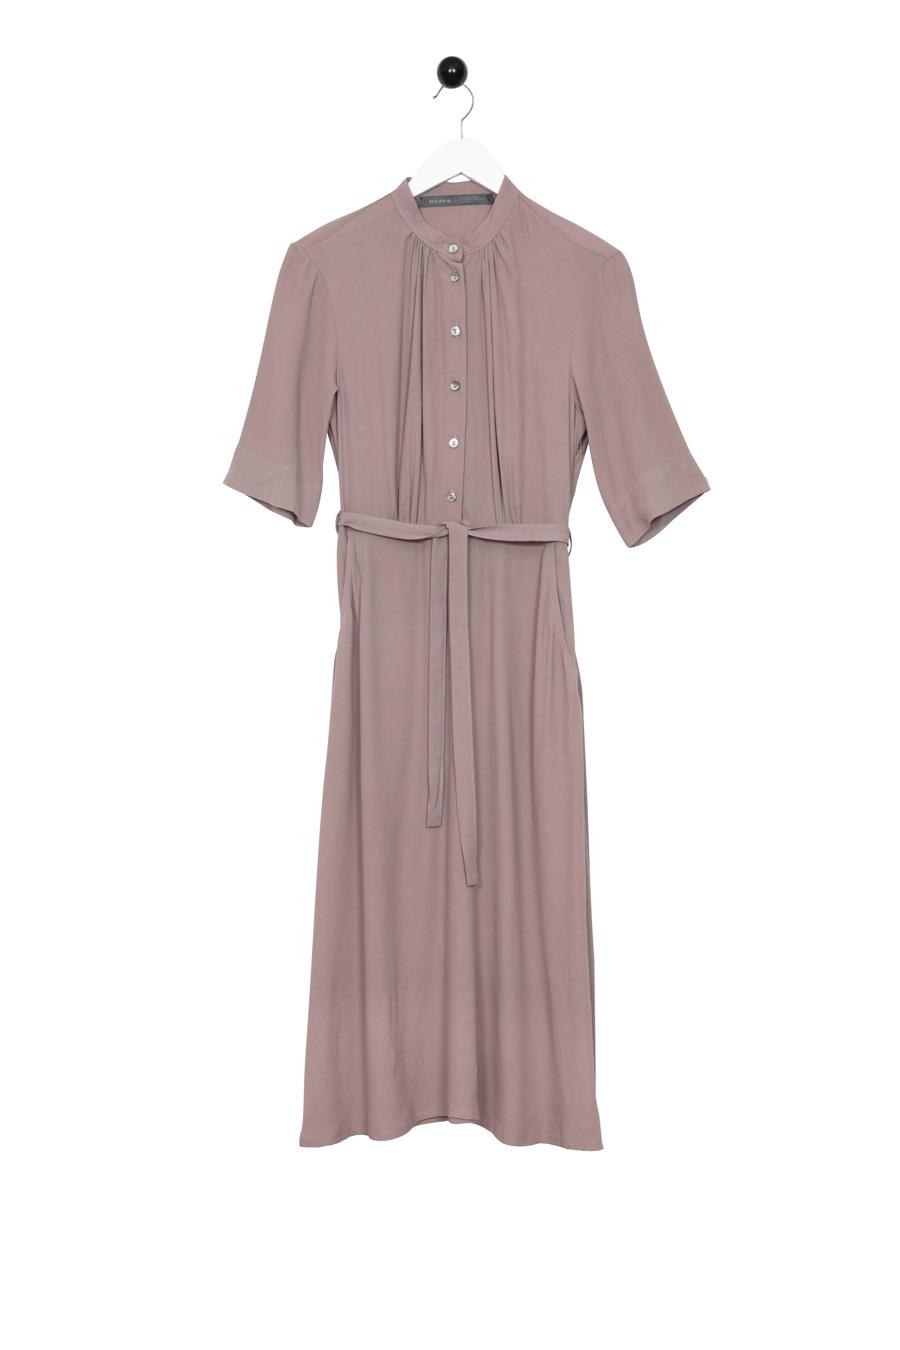 Return Amelin Dress